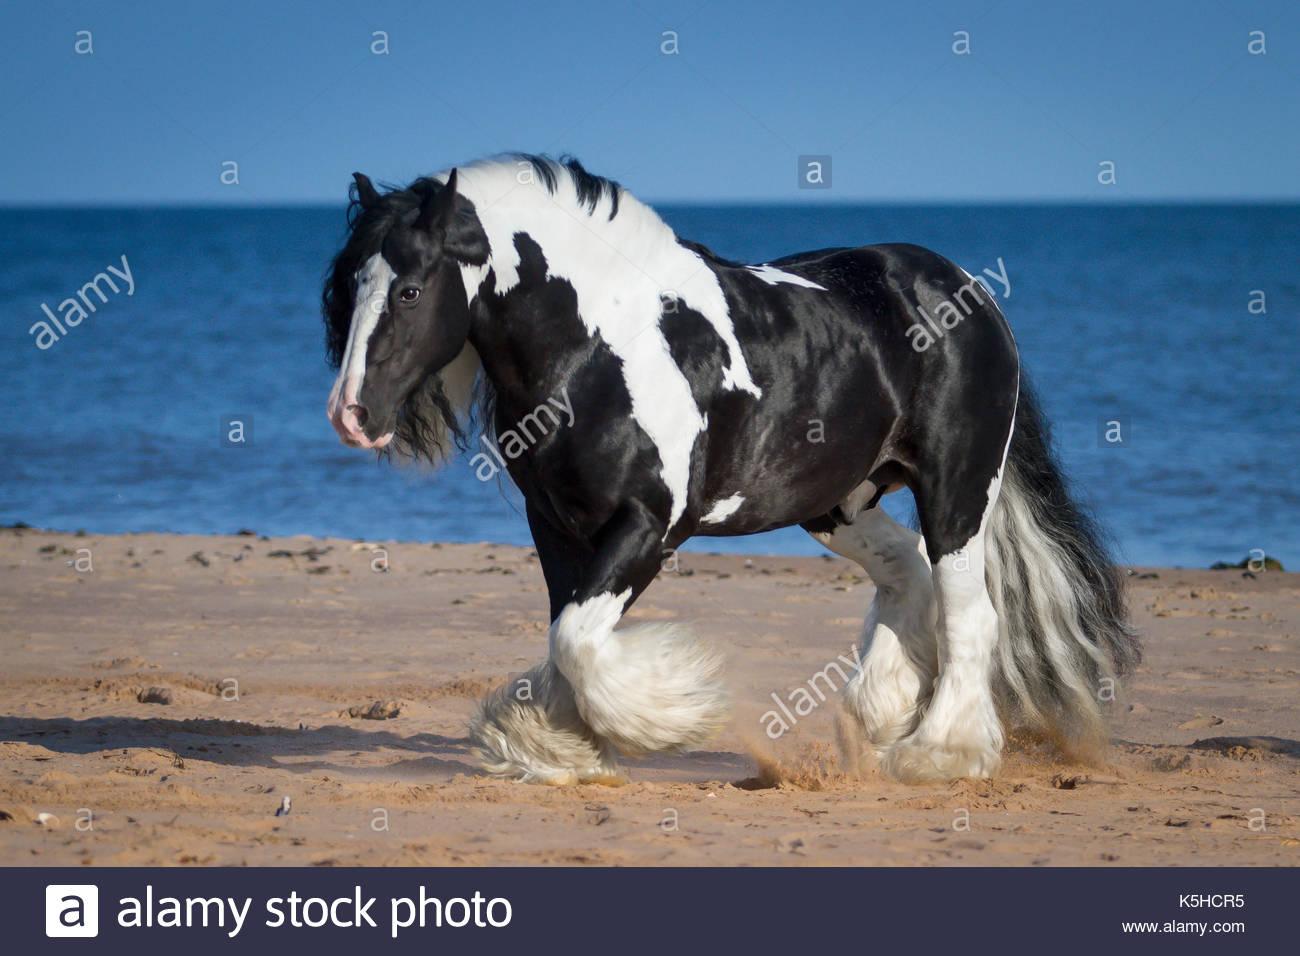 Gypsy CHorse Cob Vanner stallion on the beach - Stock Image